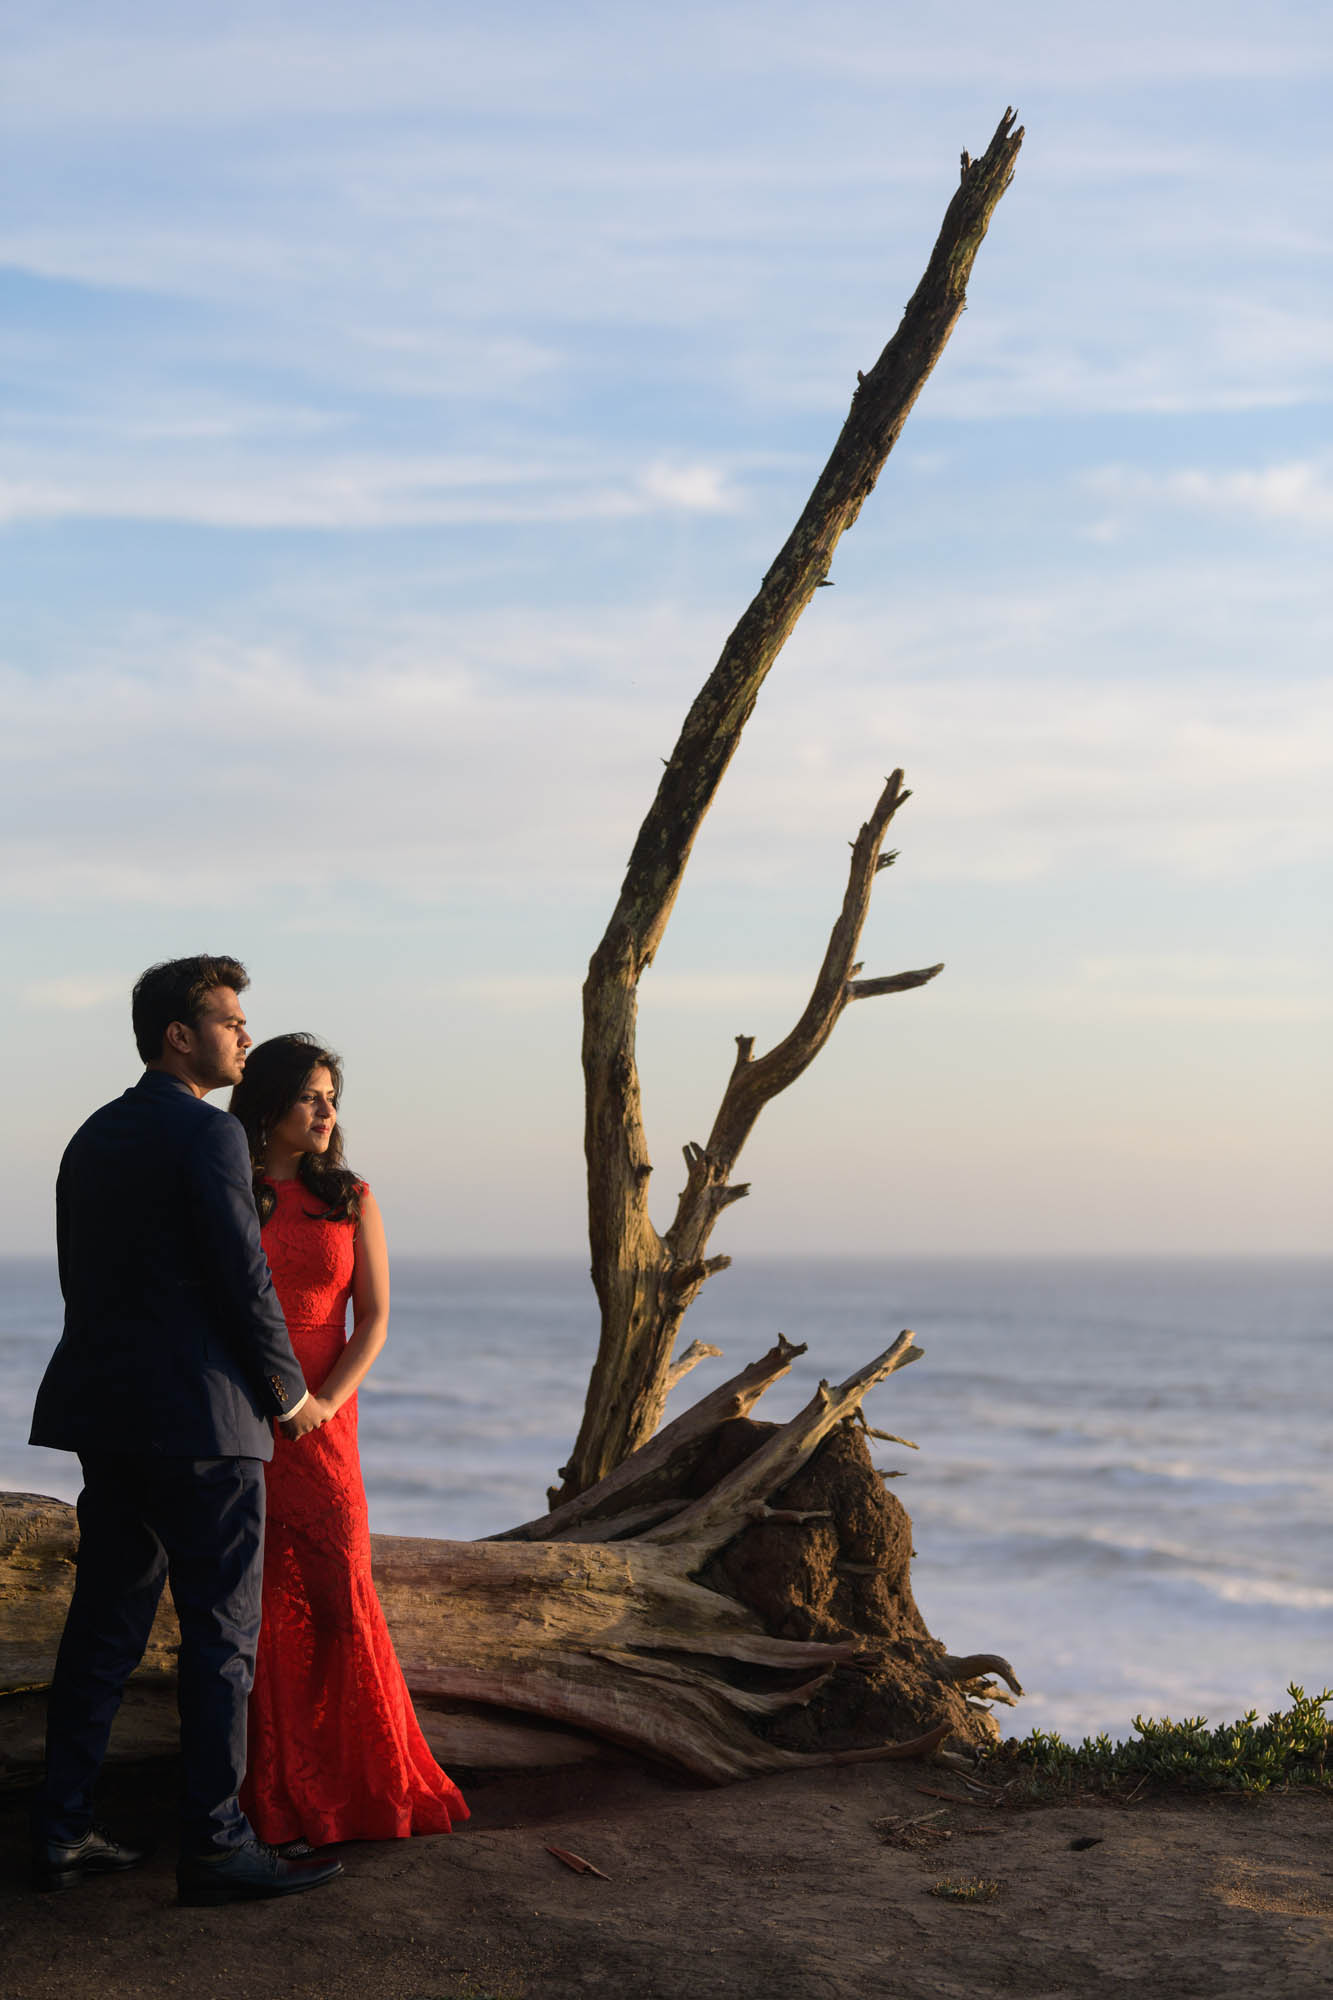 6846_Garima_and_Sushant_Fitzgerald_Marine_Reserve_Moss_Beach_Engagement_Photography.jpg